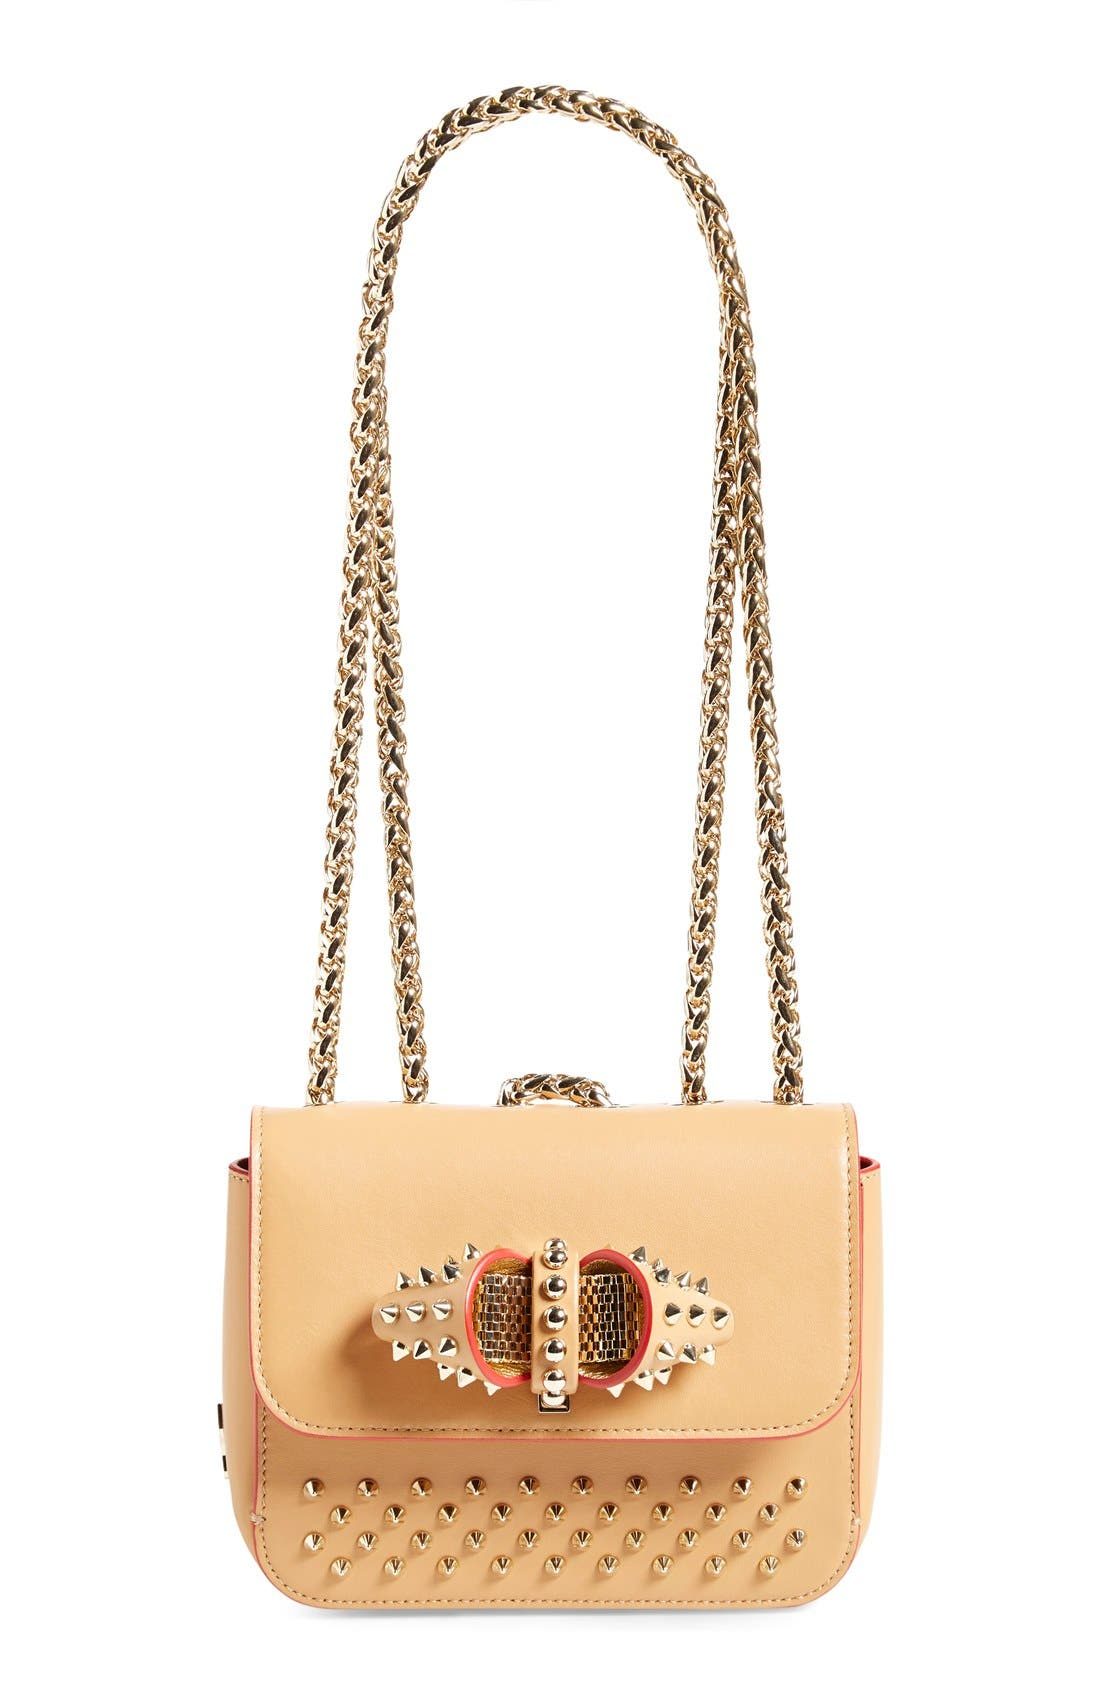 Alternate Image 1 Selected - Christian Louboutin 'Sweet Charity' Spike Calfskin Shoulder Bag